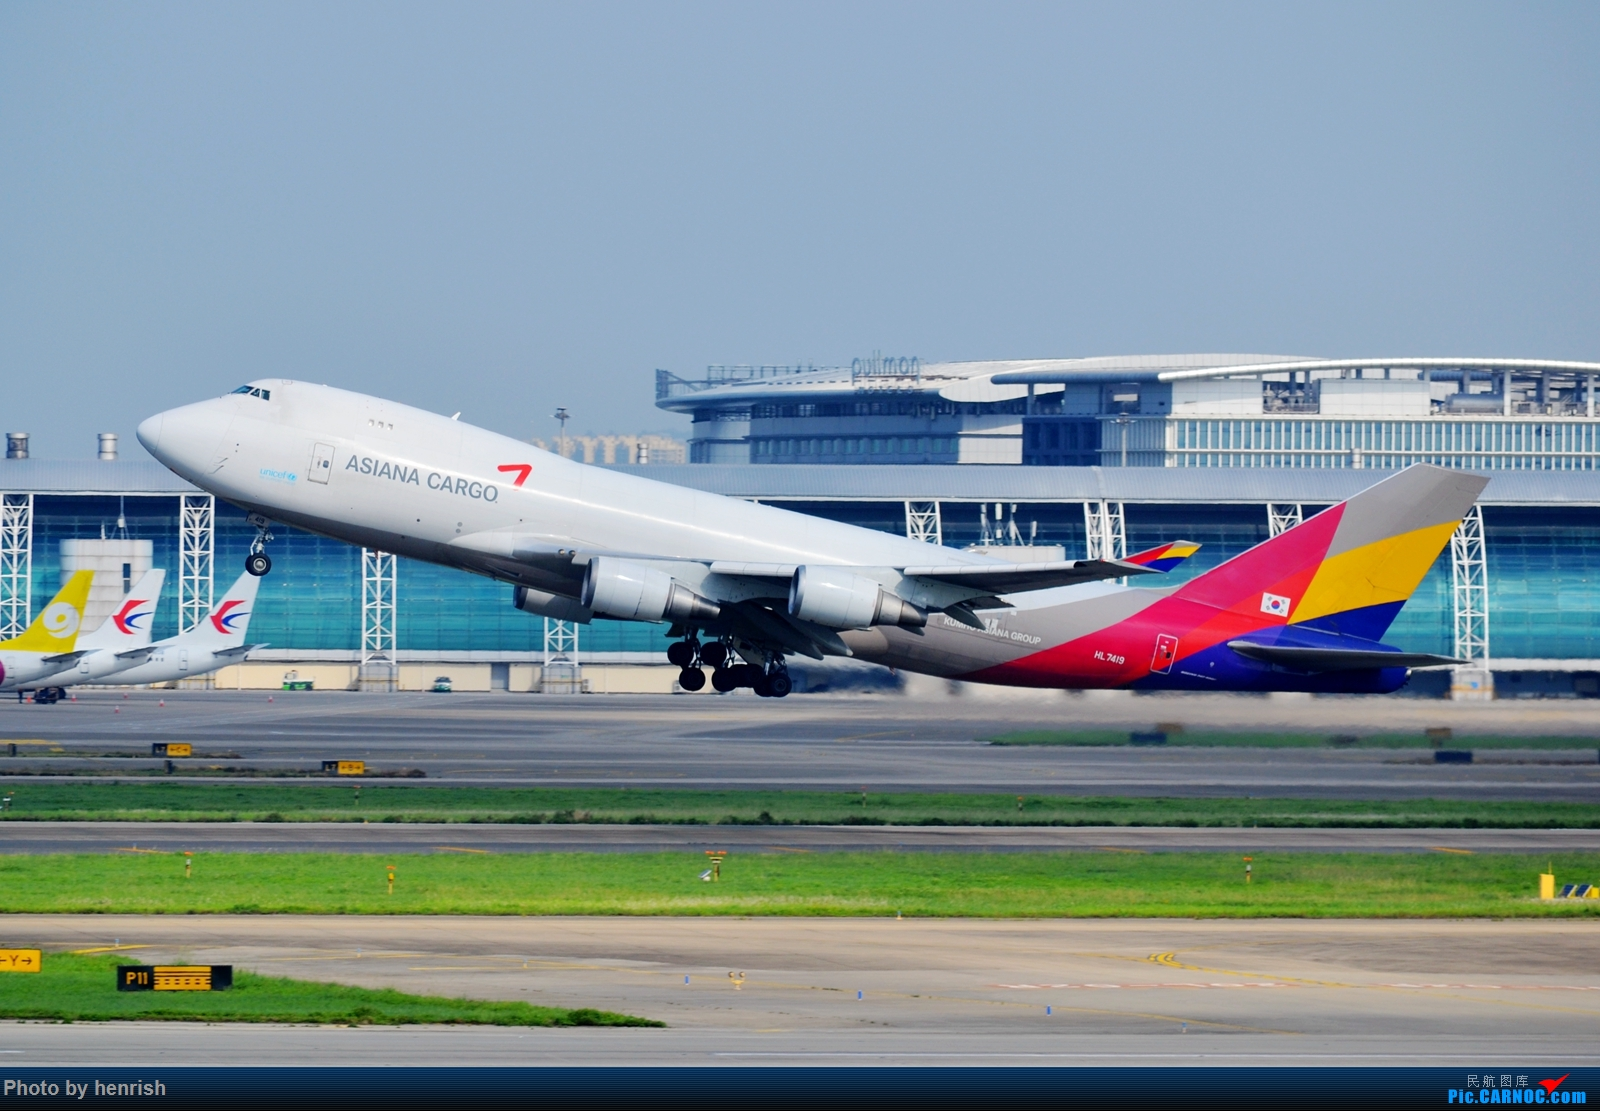 Re:[原创]【肥威的CAN】5月后半,雨季期间广州好货若干。【 广东青少年拍机小队】【广州,你好!】 BOEING 747-400F HL7419 中国广州白云国际机场